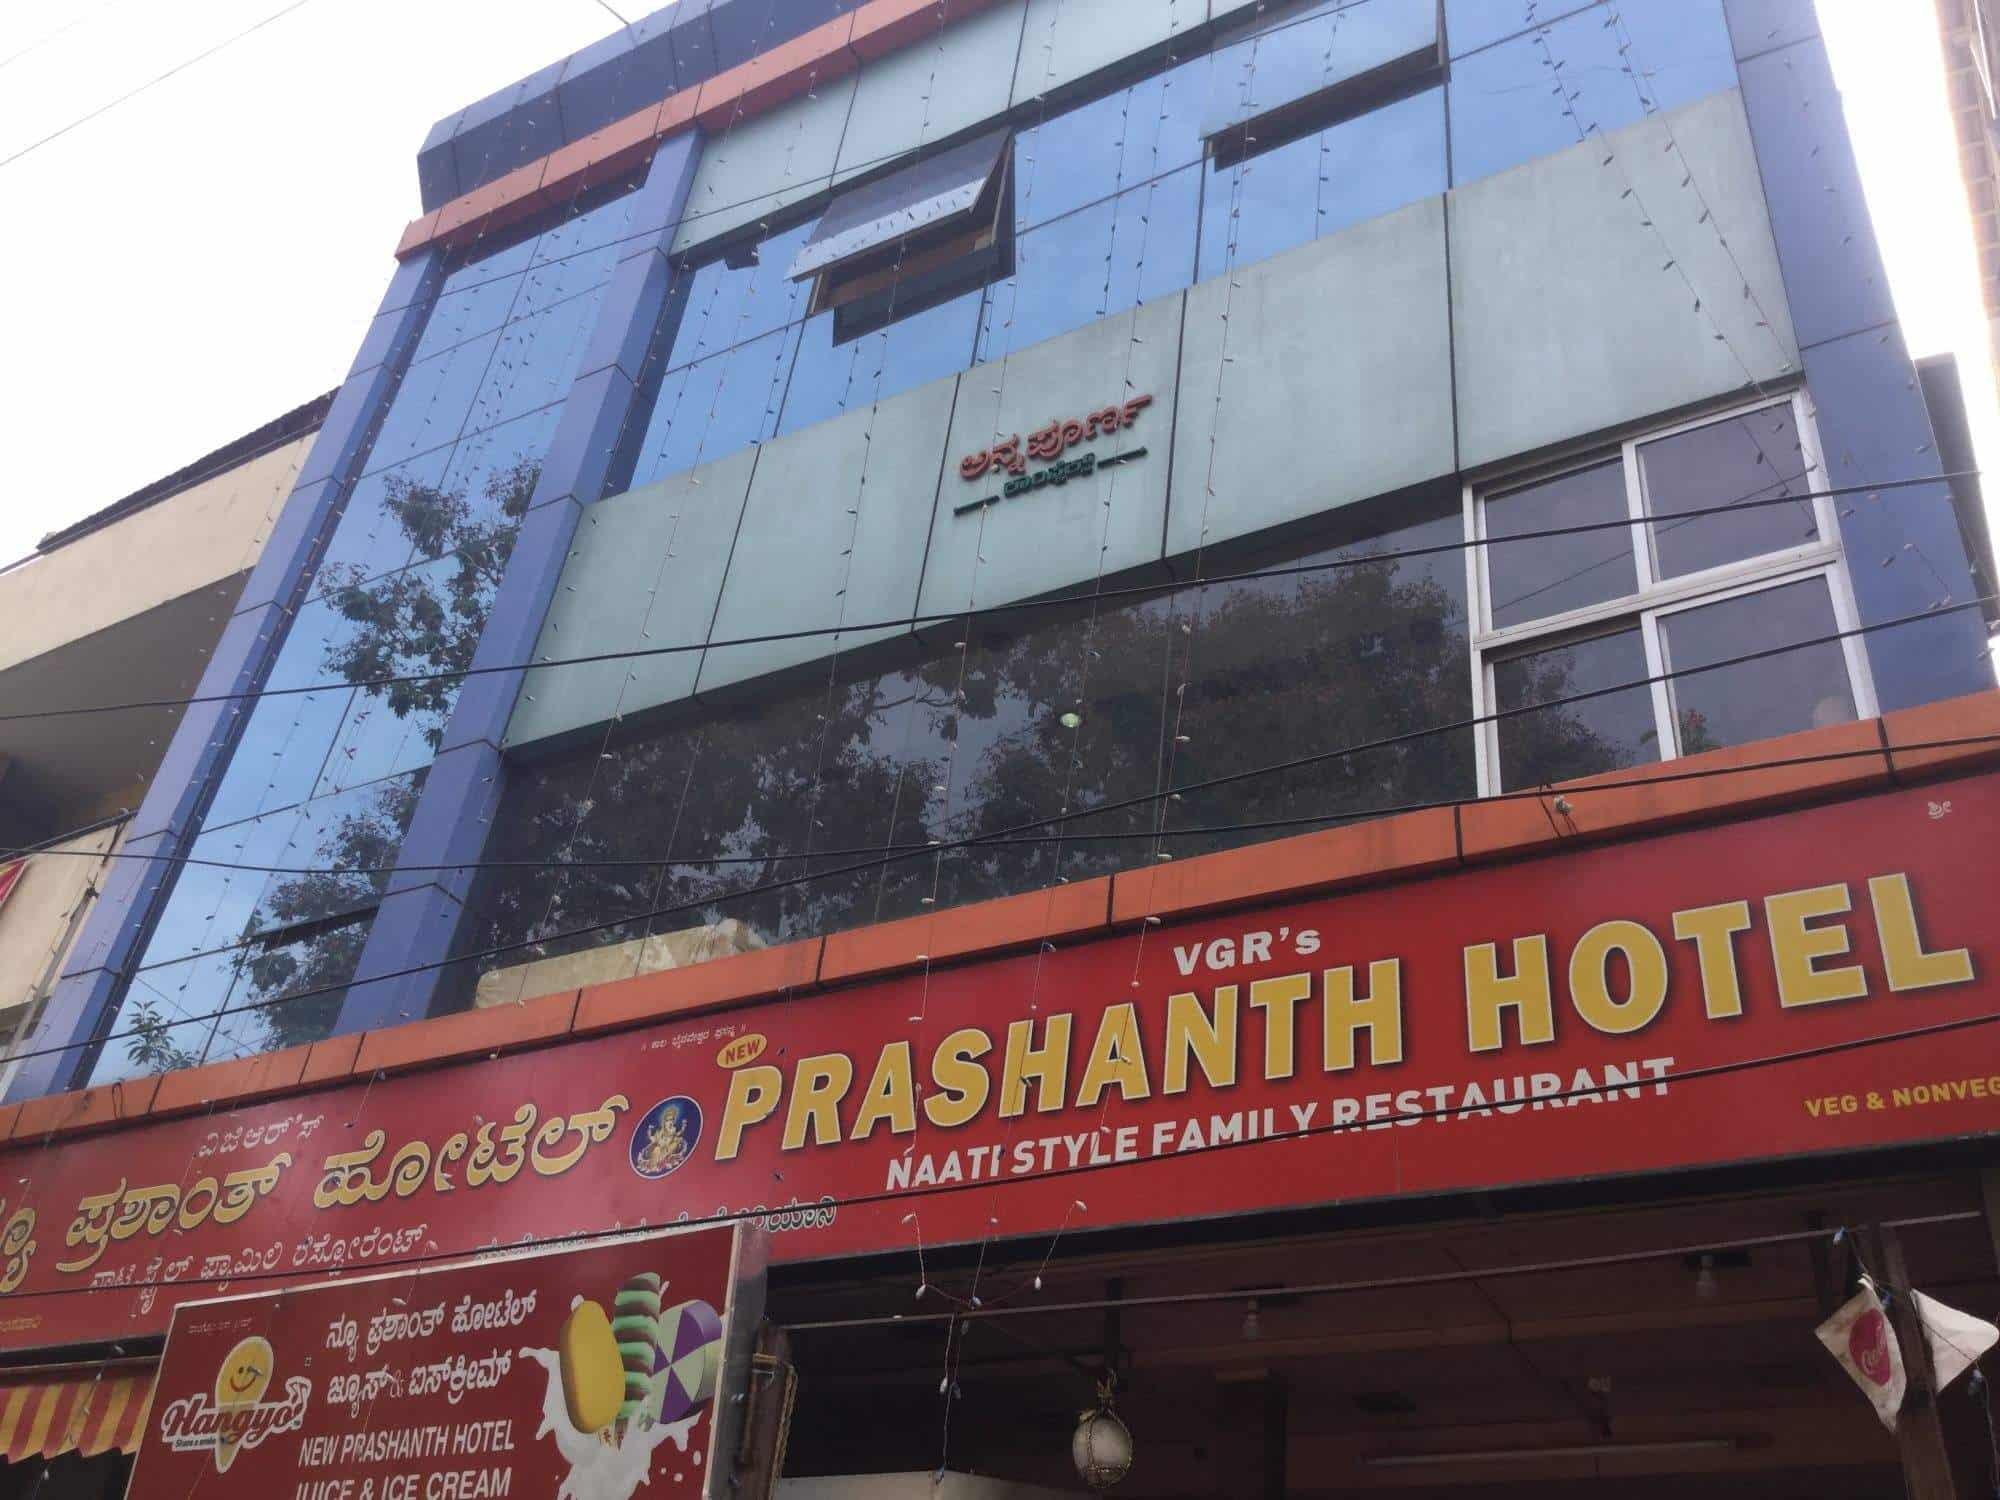 New Prashanth Hotel Malleswaram Bangalore South Indian Cuisine Restaurant Justdial